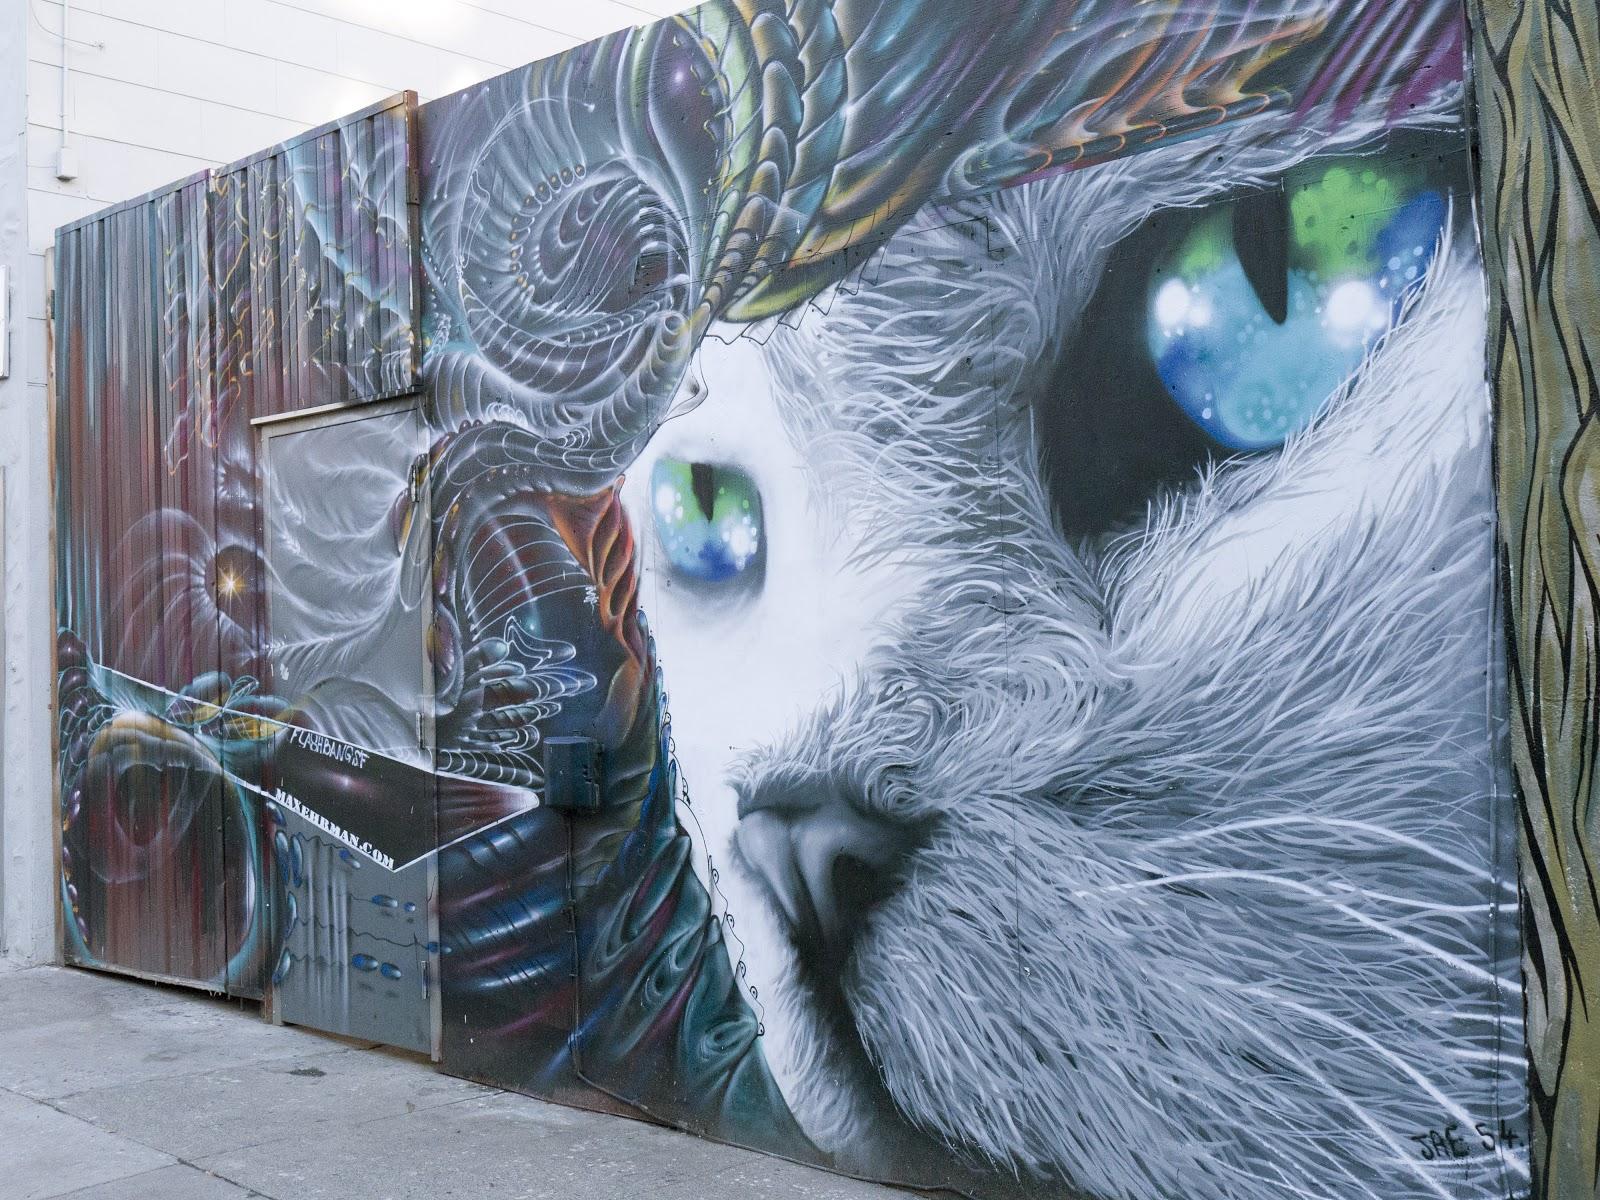 Urban Street Artist Spy The Dna Life